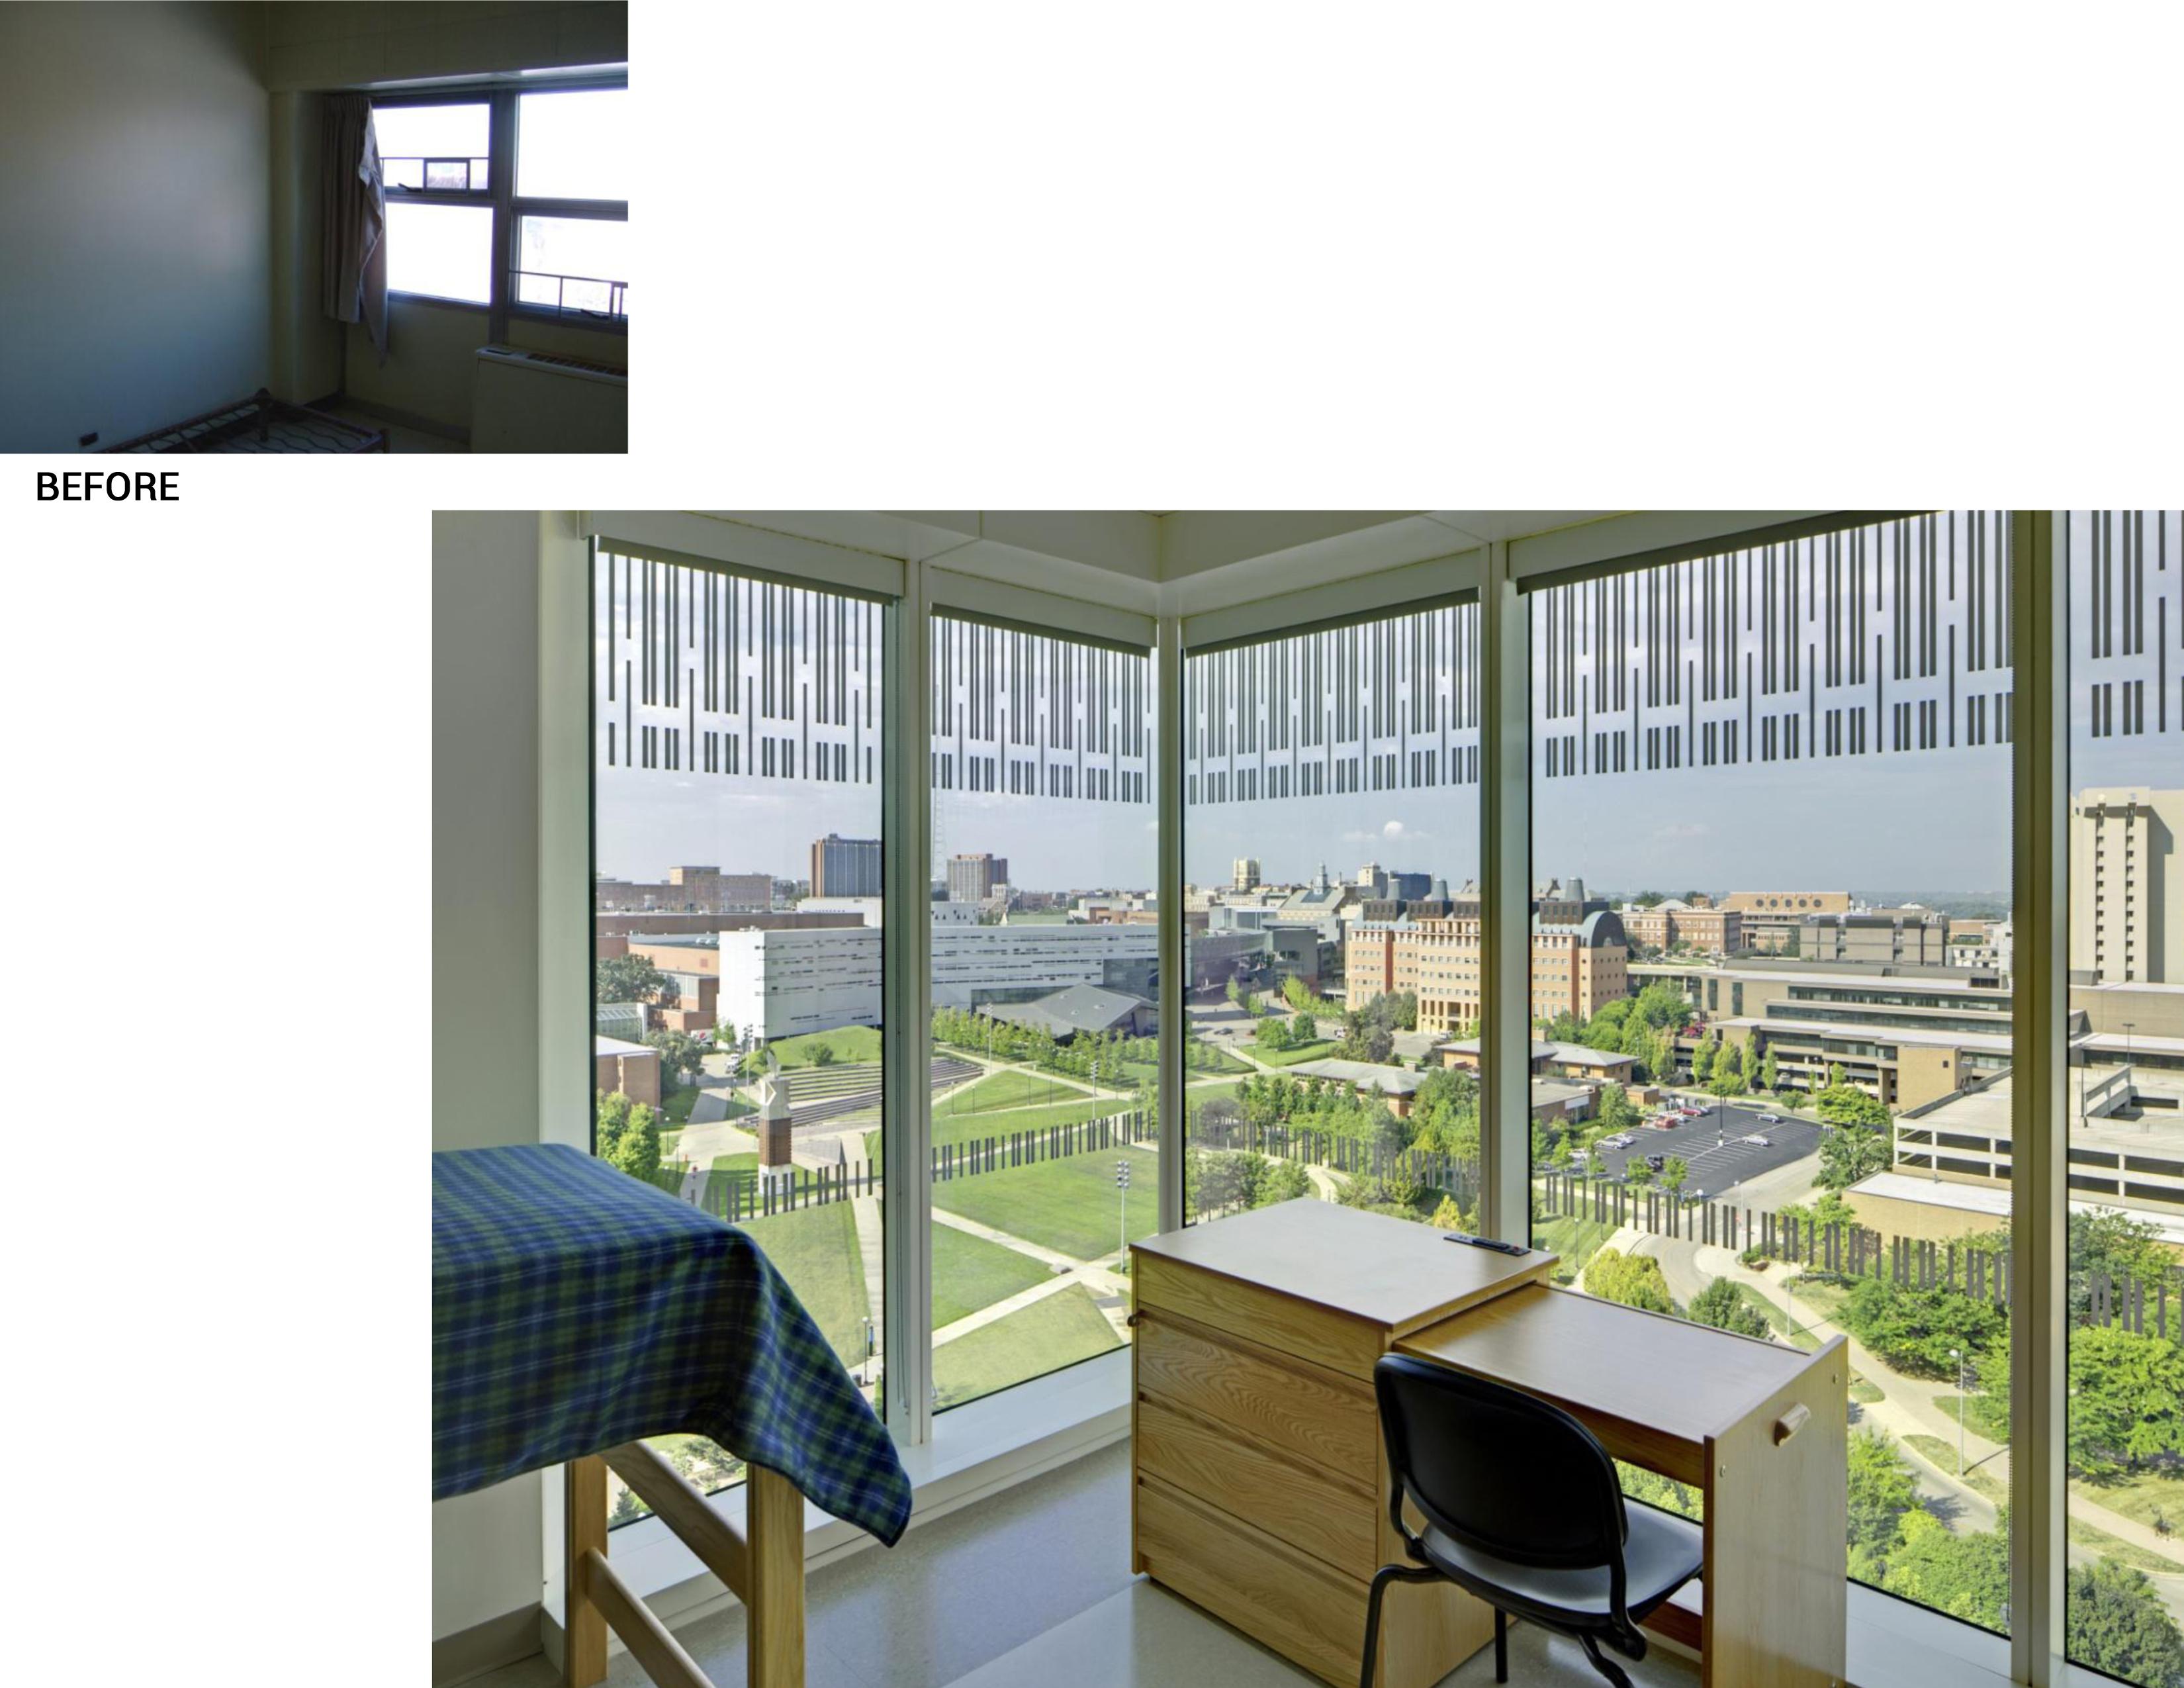 University of Cincinnati Scioto Hall | Richard Fleischman + Partners Architects Inc.